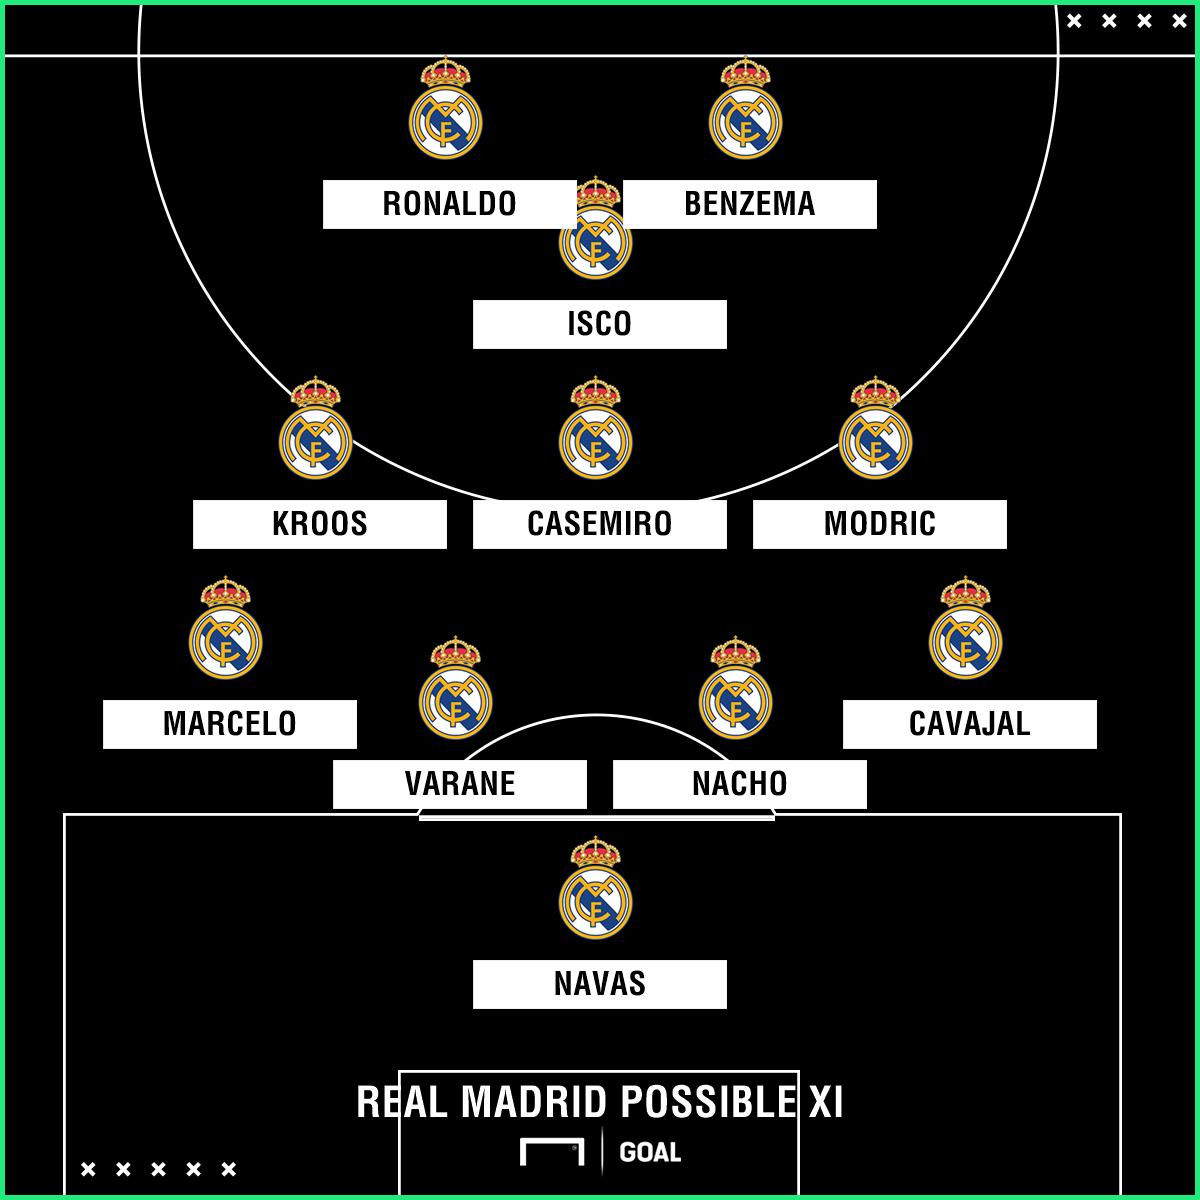 Celta Vigo Vs Barca Full Match: Real Madrid Team News: Injuries, Suspensions And Line-up